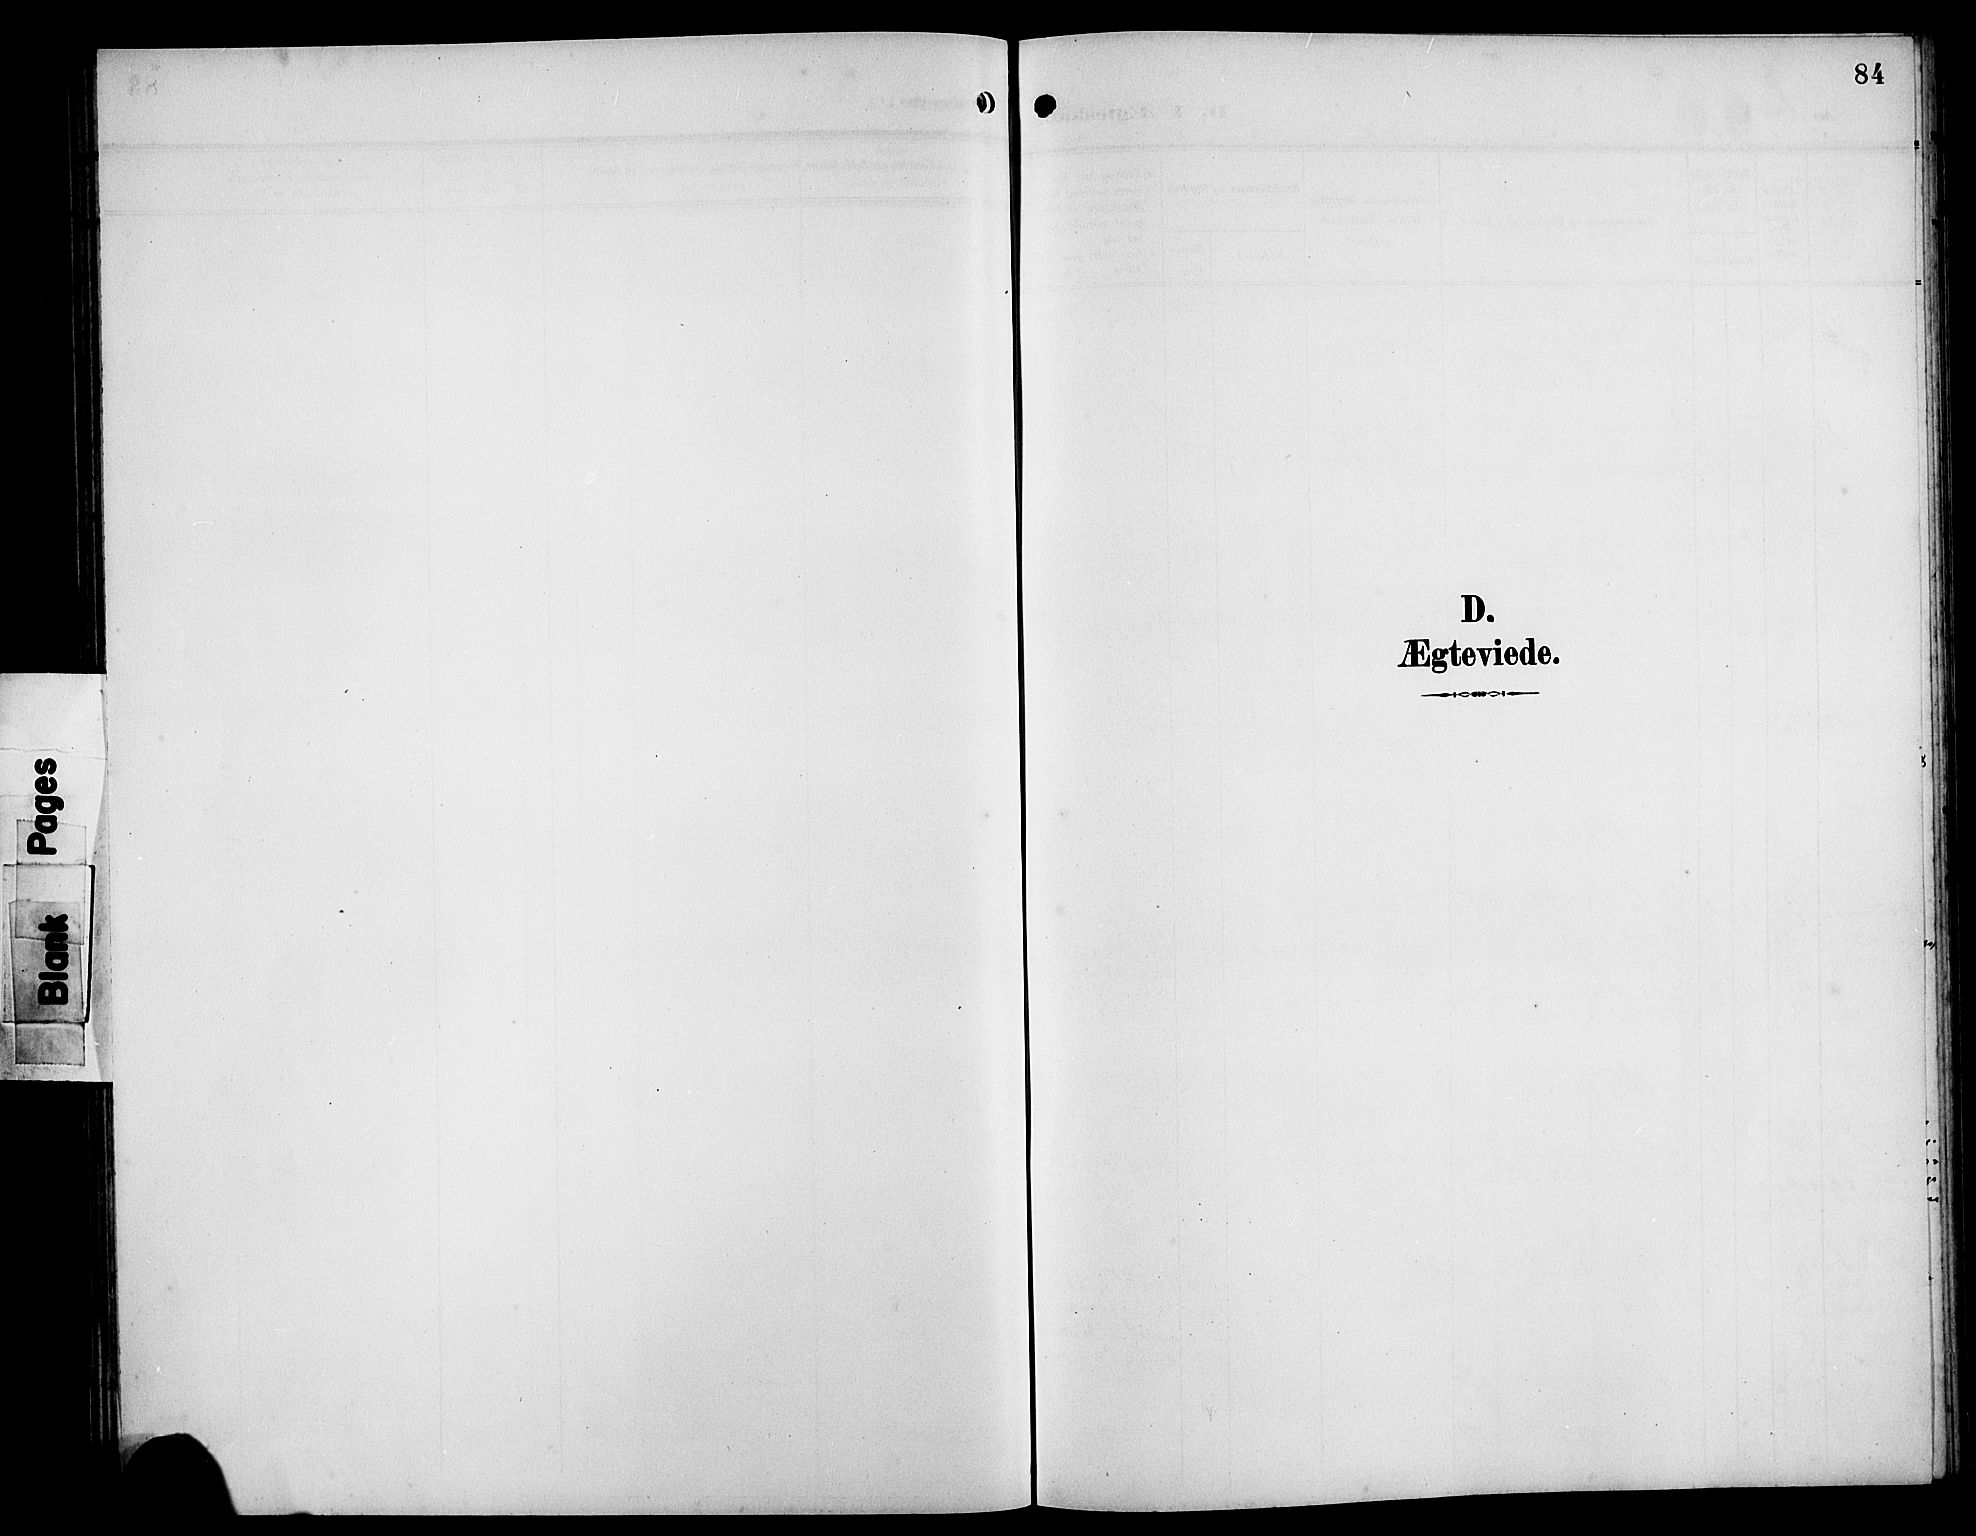 SAB, Bremanger Sokneprestembete, H/Hab: Klokkerbok nr. B 1, 1906-1925, s. 84